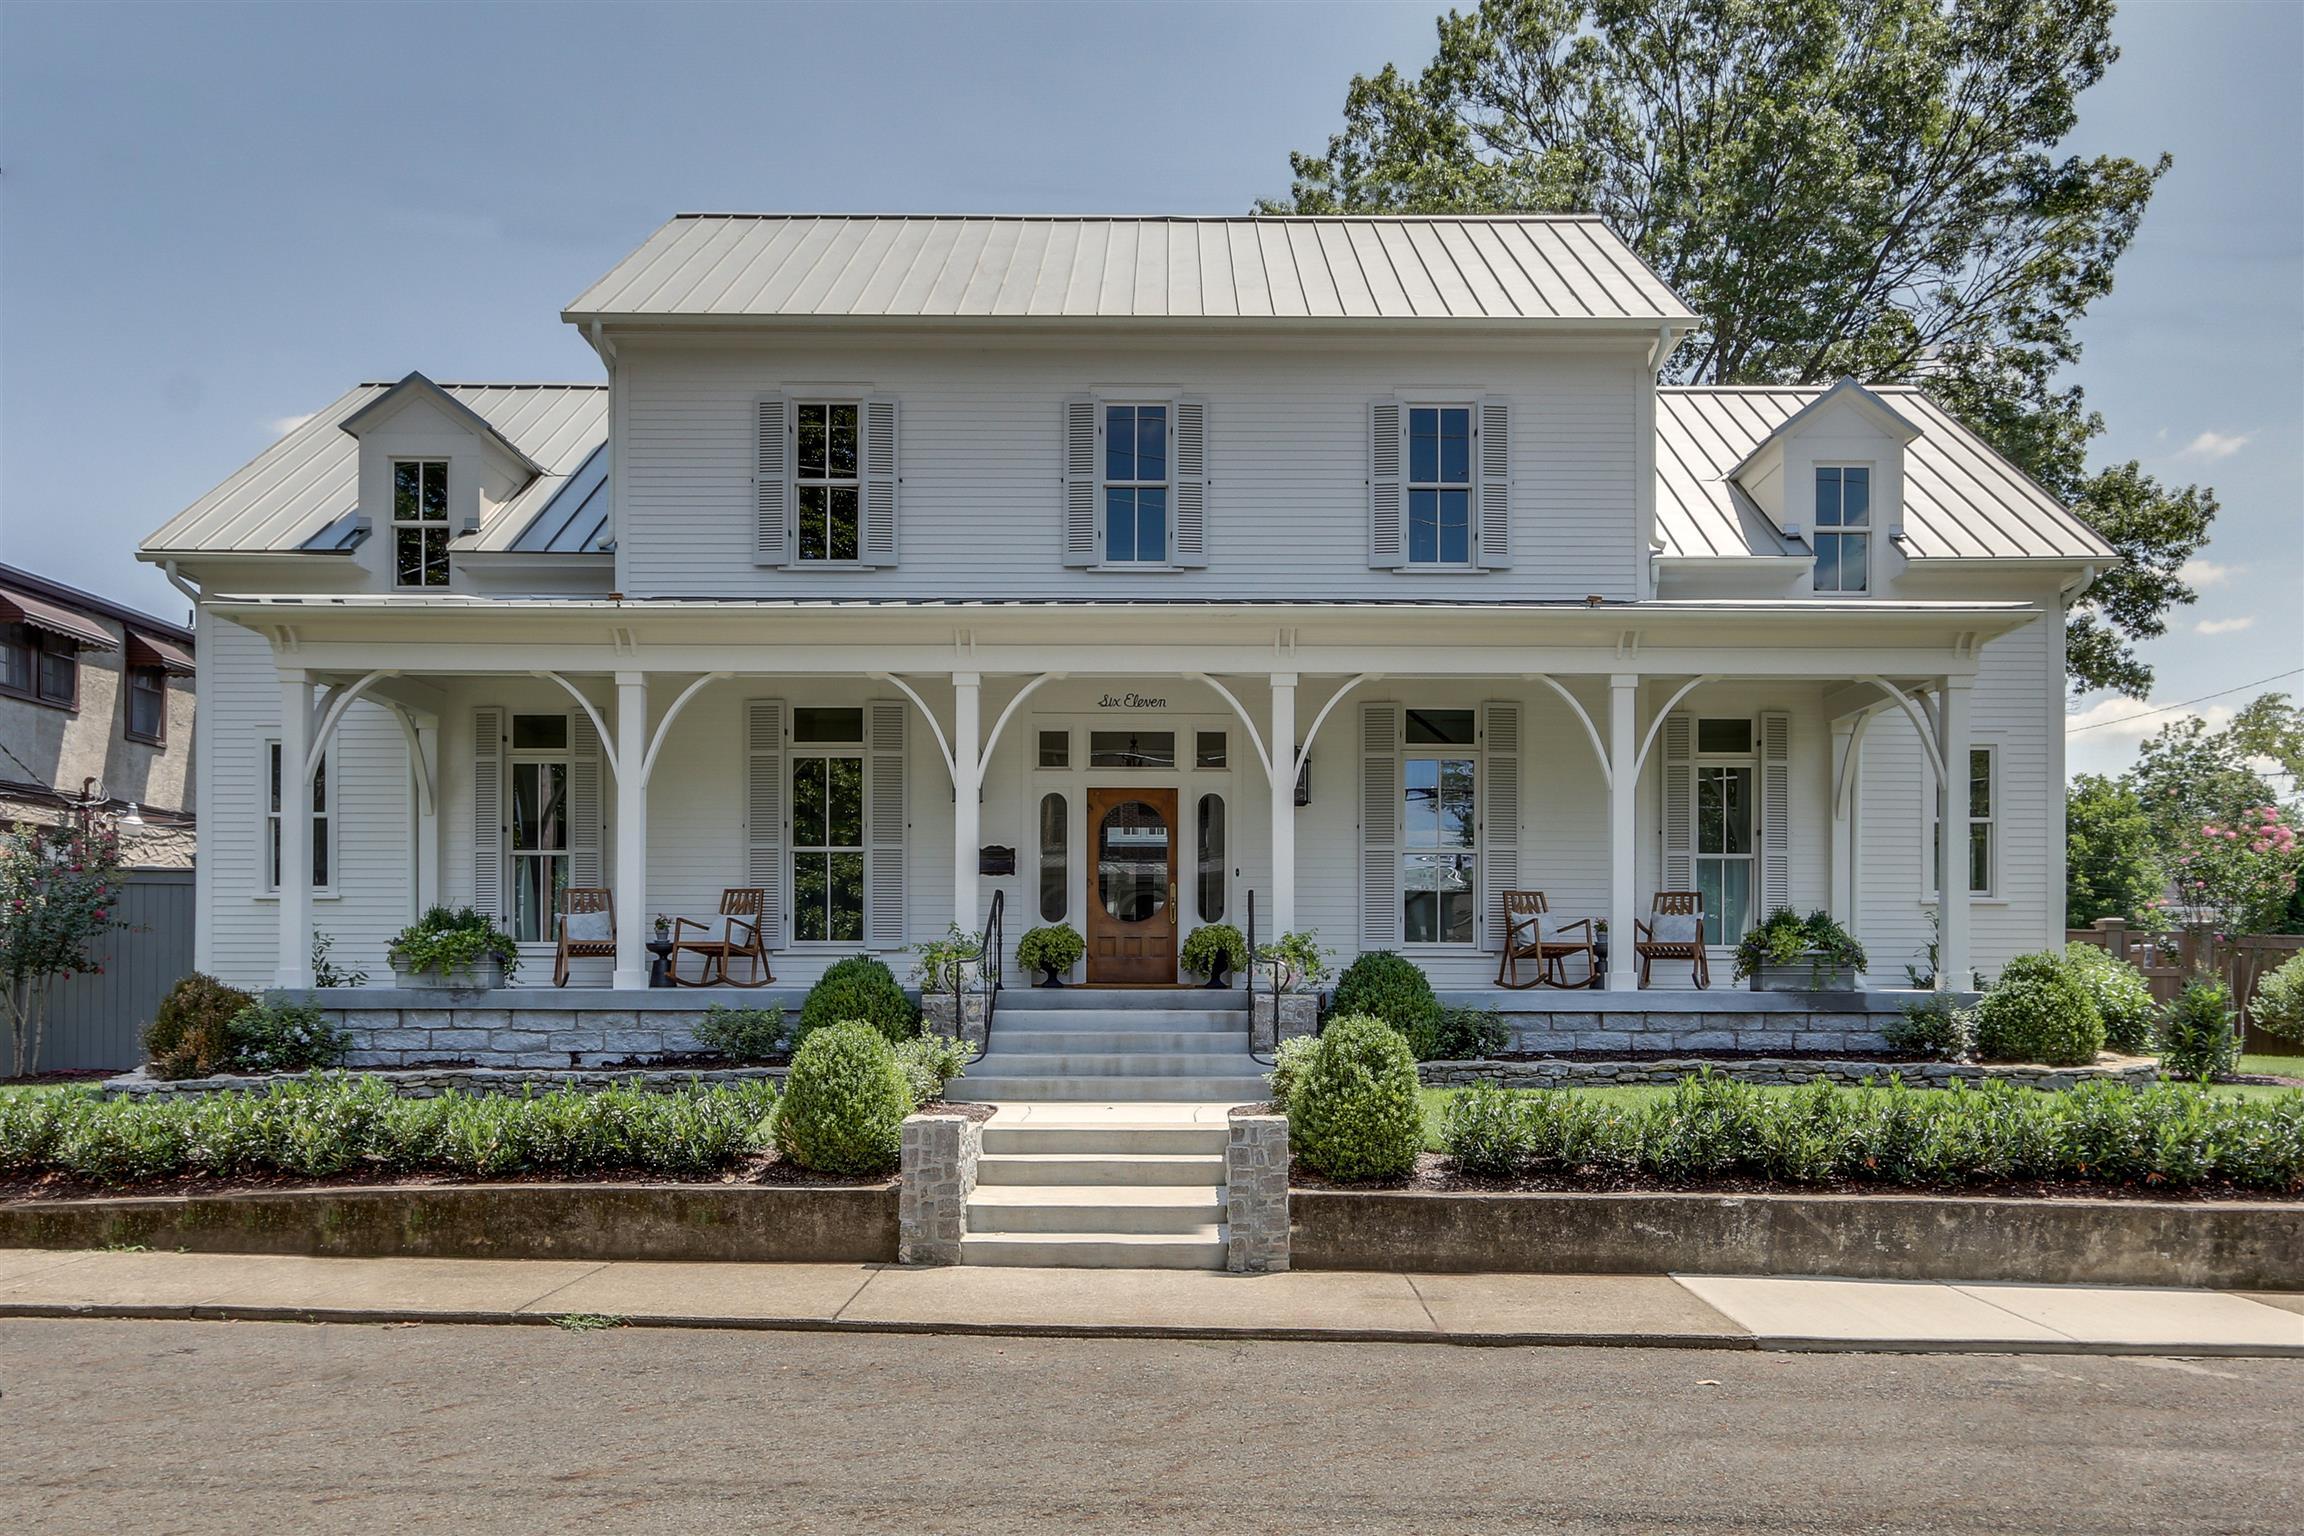 $2,762,000 - 6Br/7Ba -  for Sale in Historic Franklin, Franklin